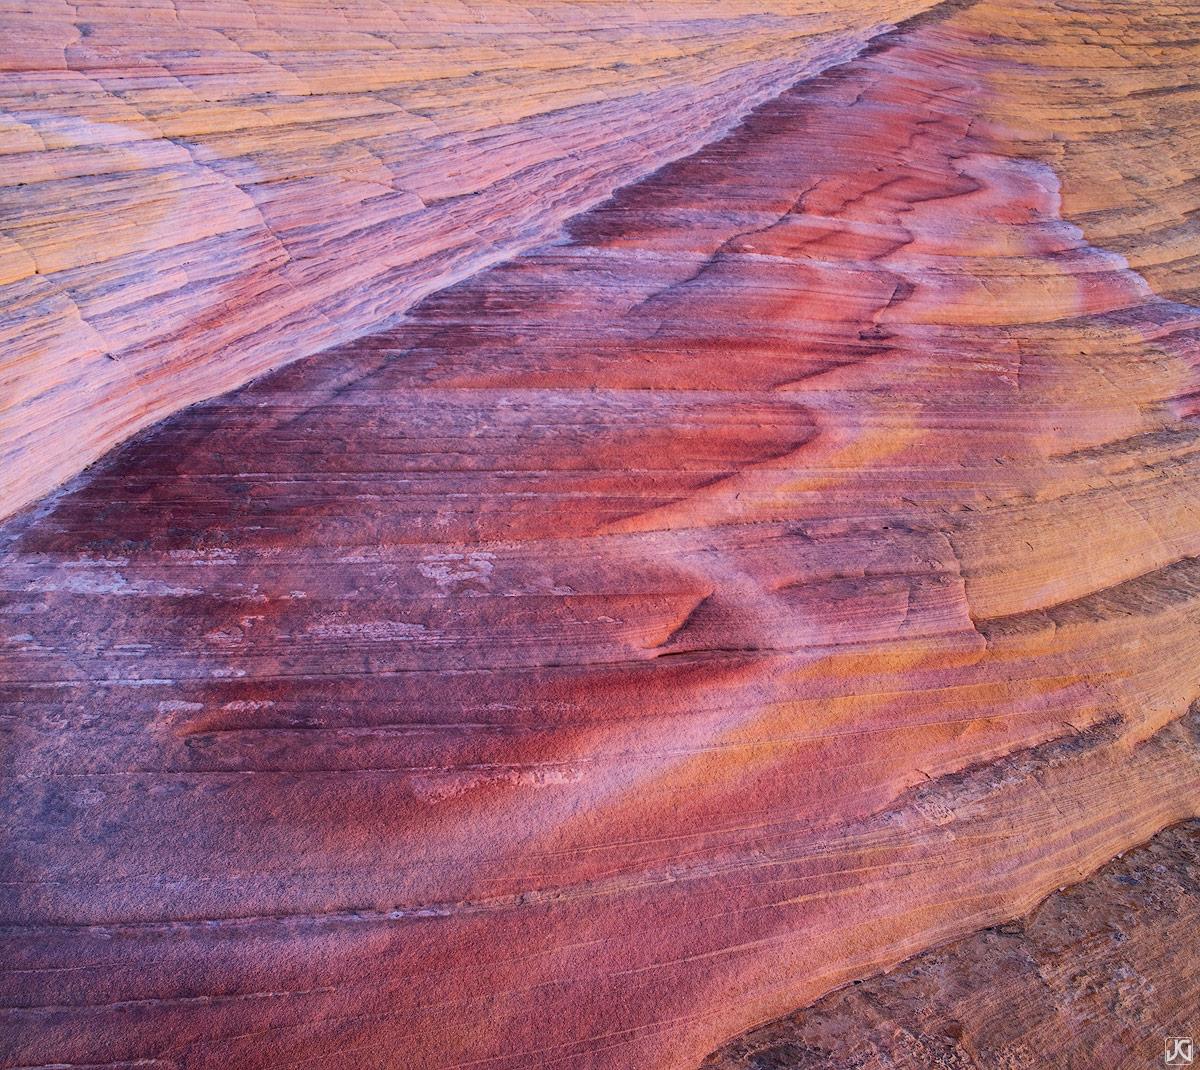 Utah, Yellow Rock, sandstone, abstract, Grand Staircase, Escalante, photo